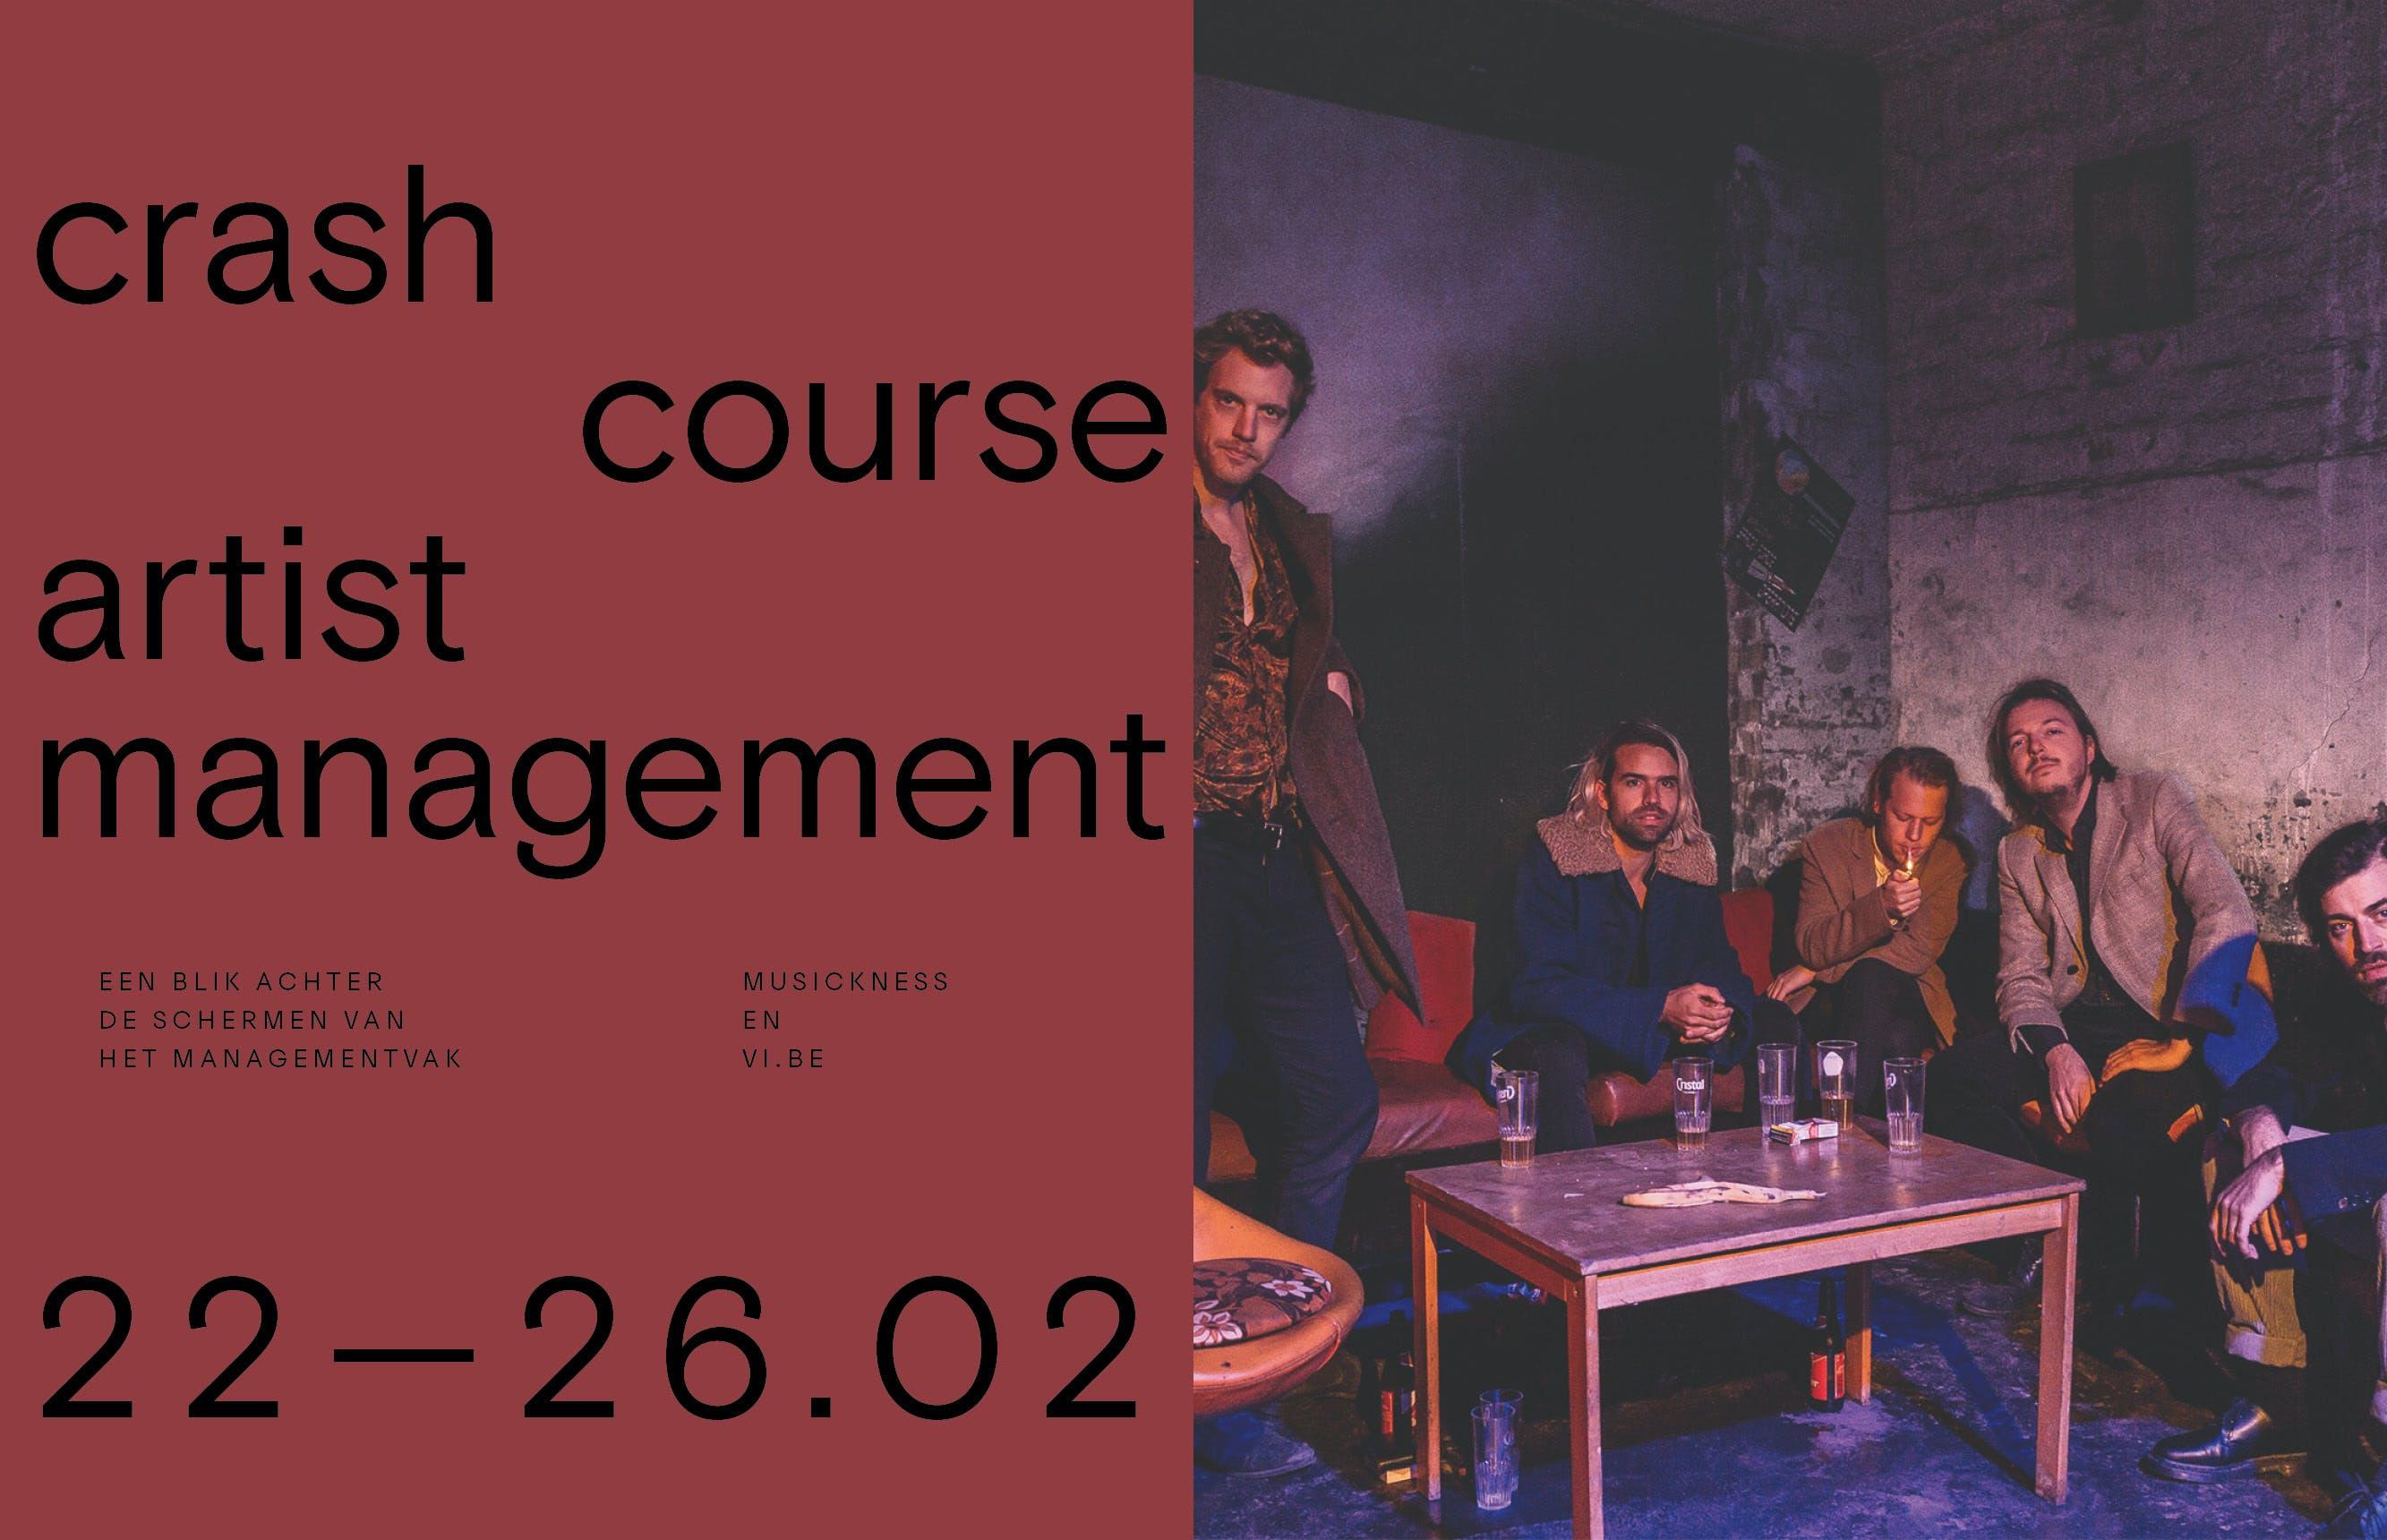 Musickness & VI.BE stellen voor: Crash Course Artist Management